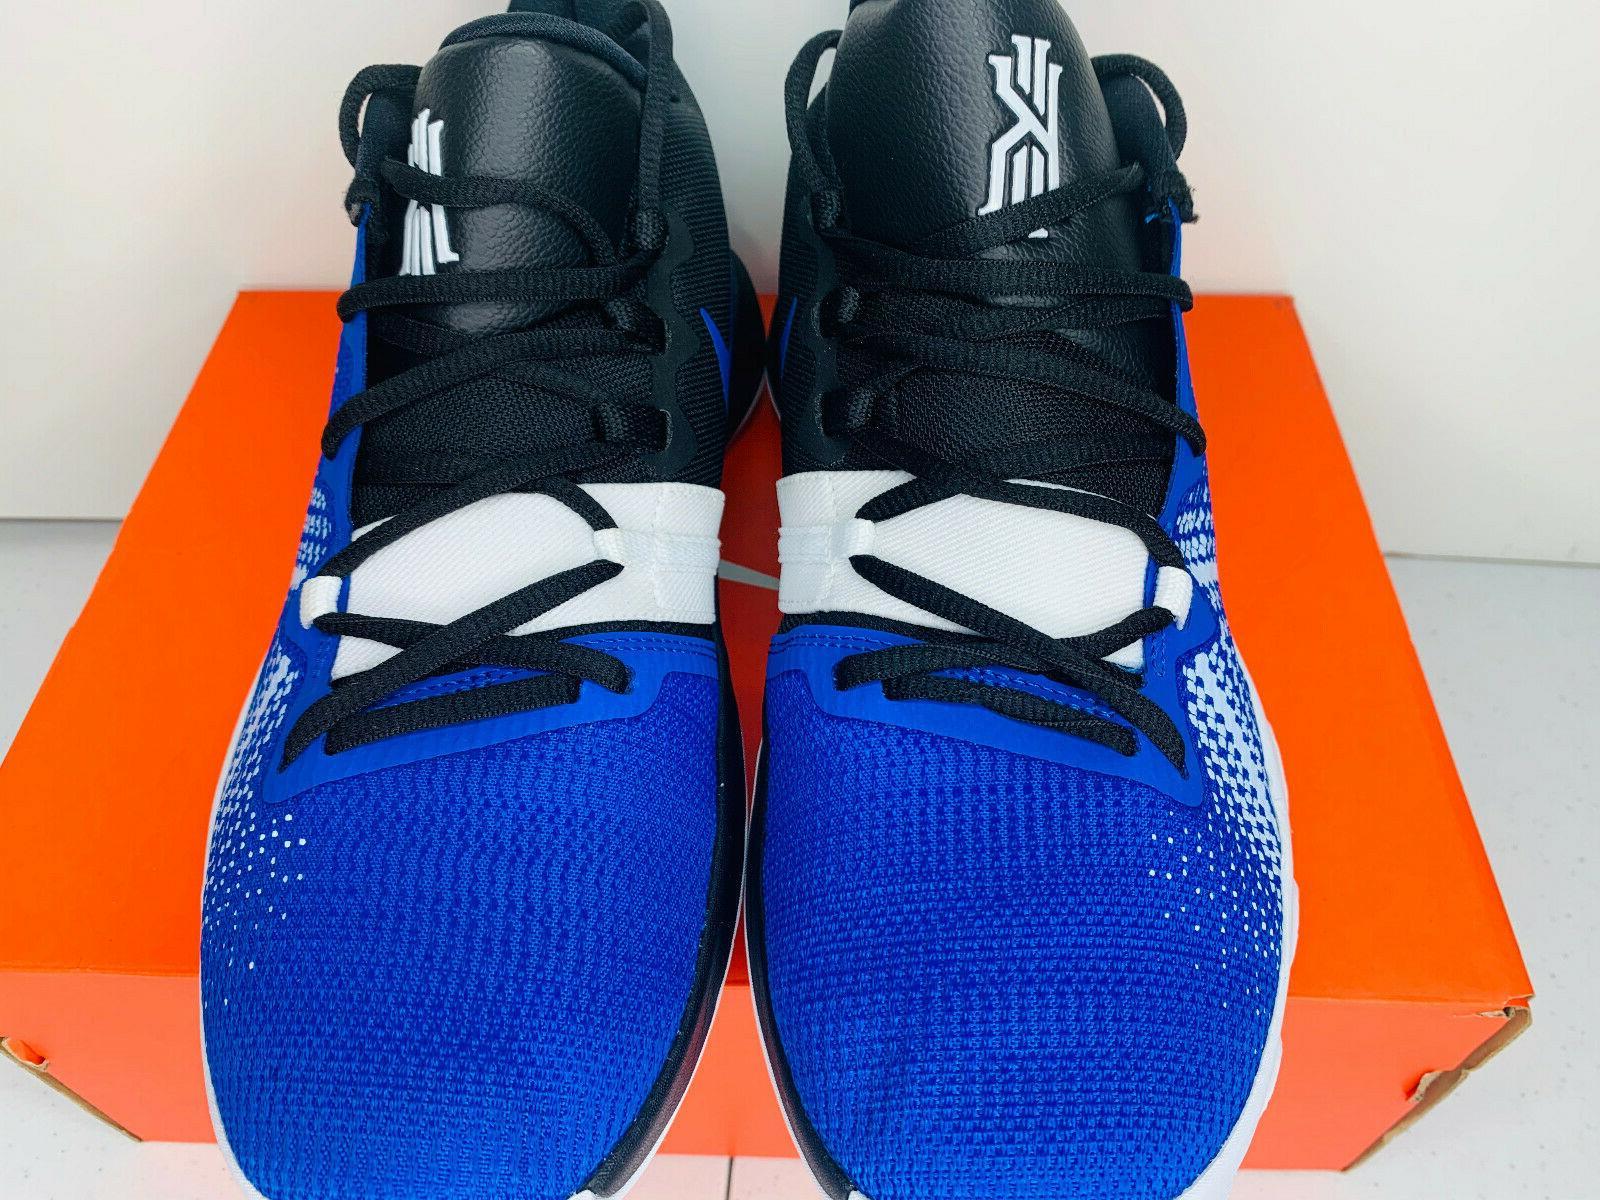 NIB 9.5-15 MEN Nike Basketball Shoes Blue White Black